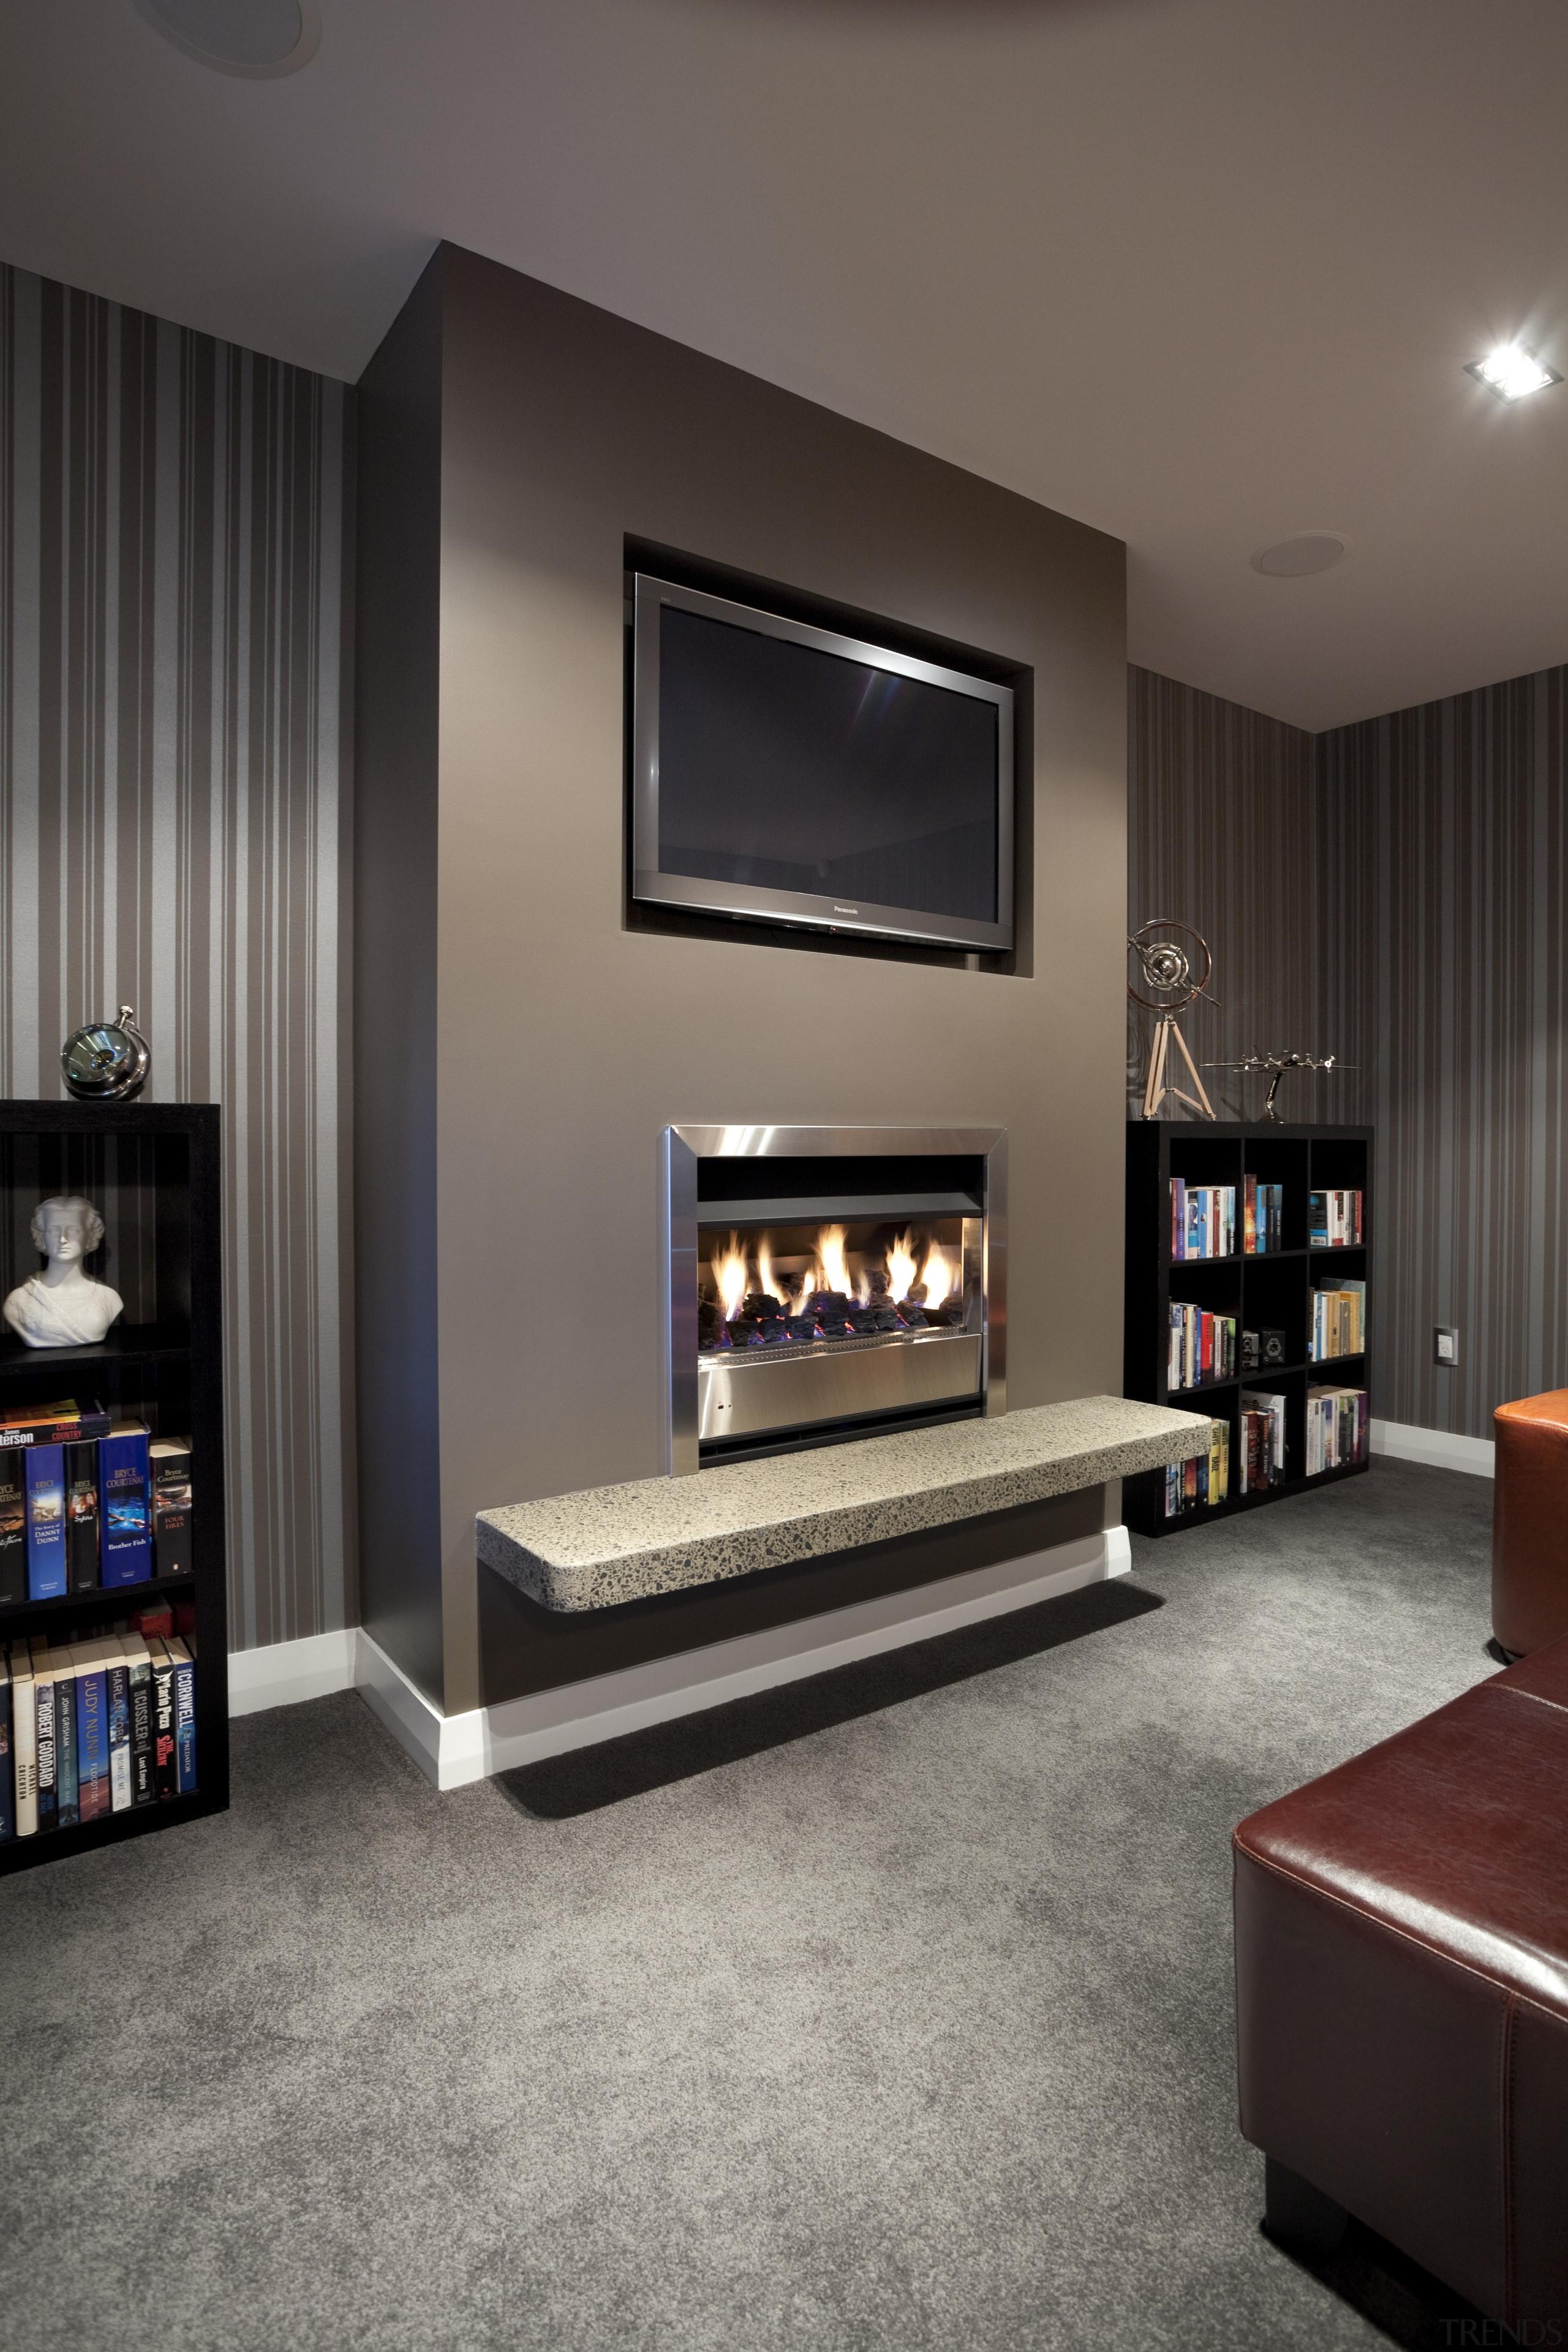 tv screen above fireplace in dark wallpapered room fireplace, floor, flooring, furniture, hearth, interior design, living room, room, gray, black